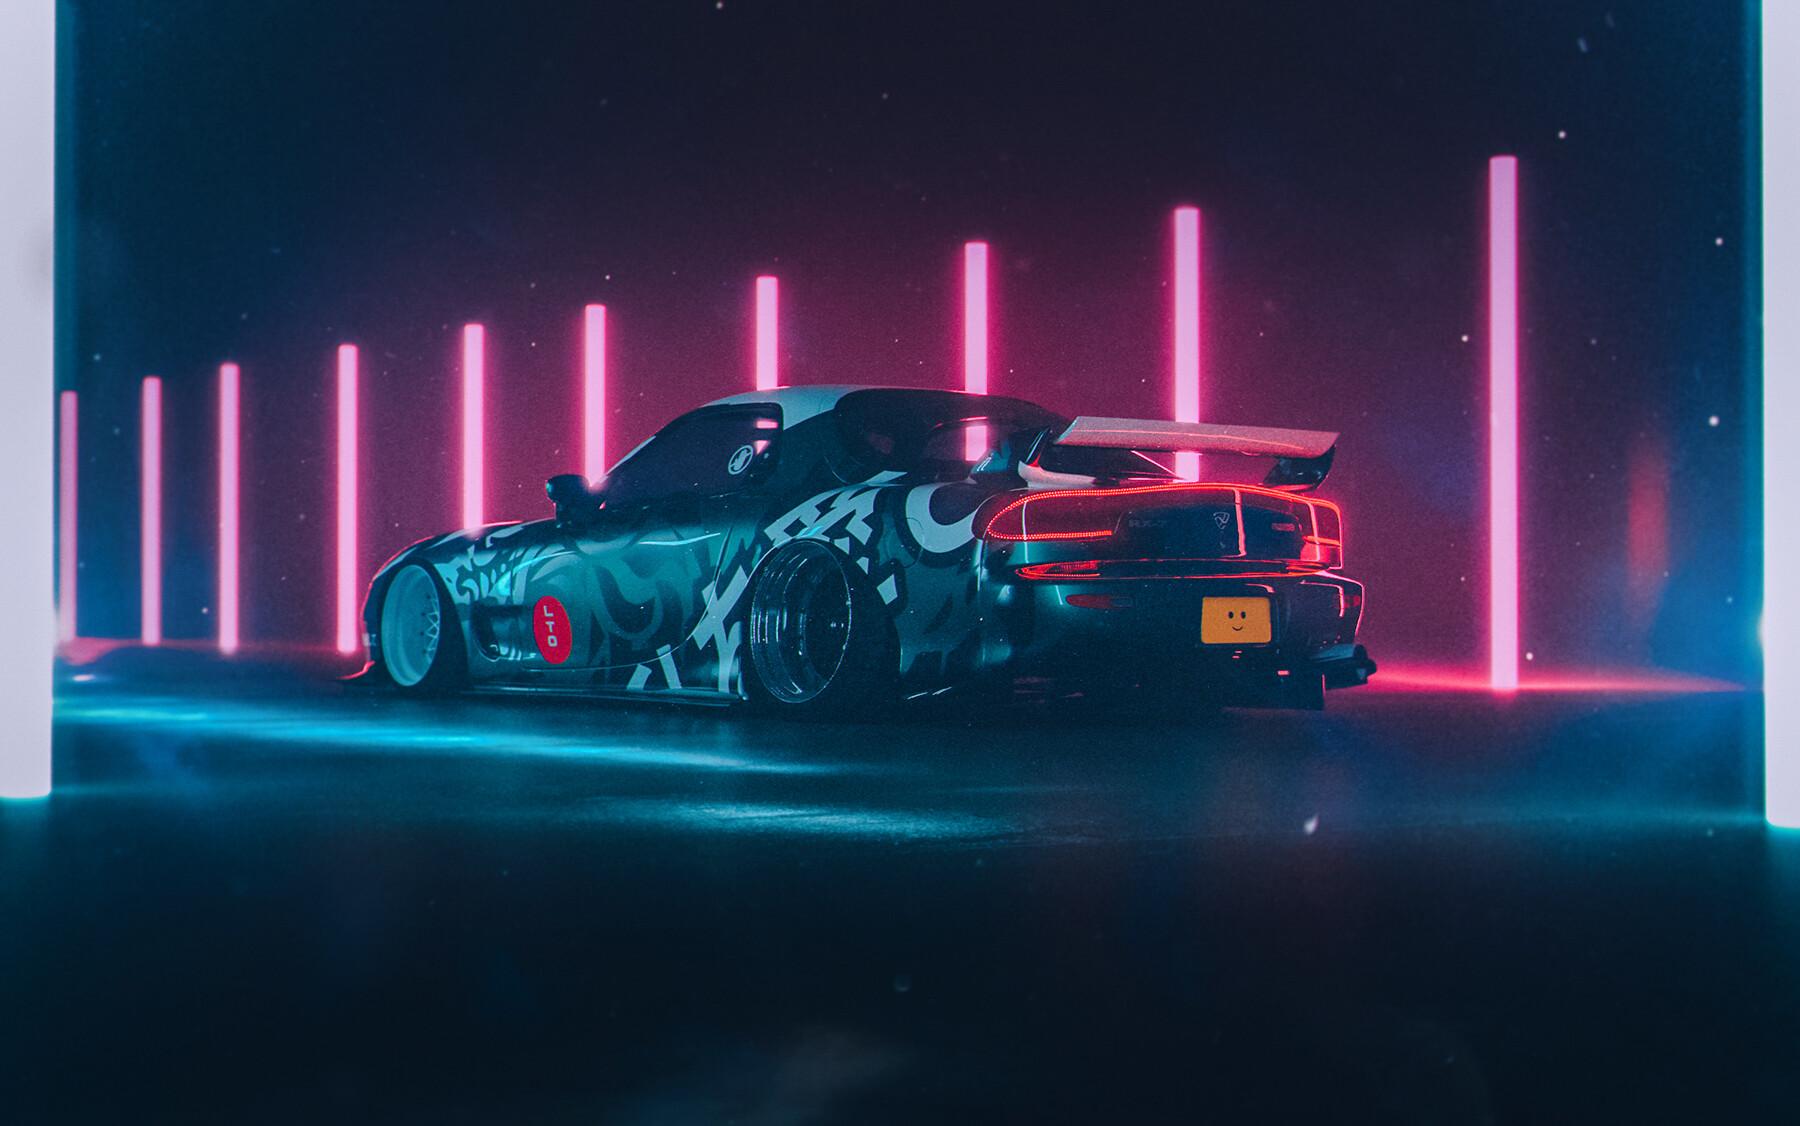 Wallpaper Sports Car Retro Car Neon 1800x1126 Elizium